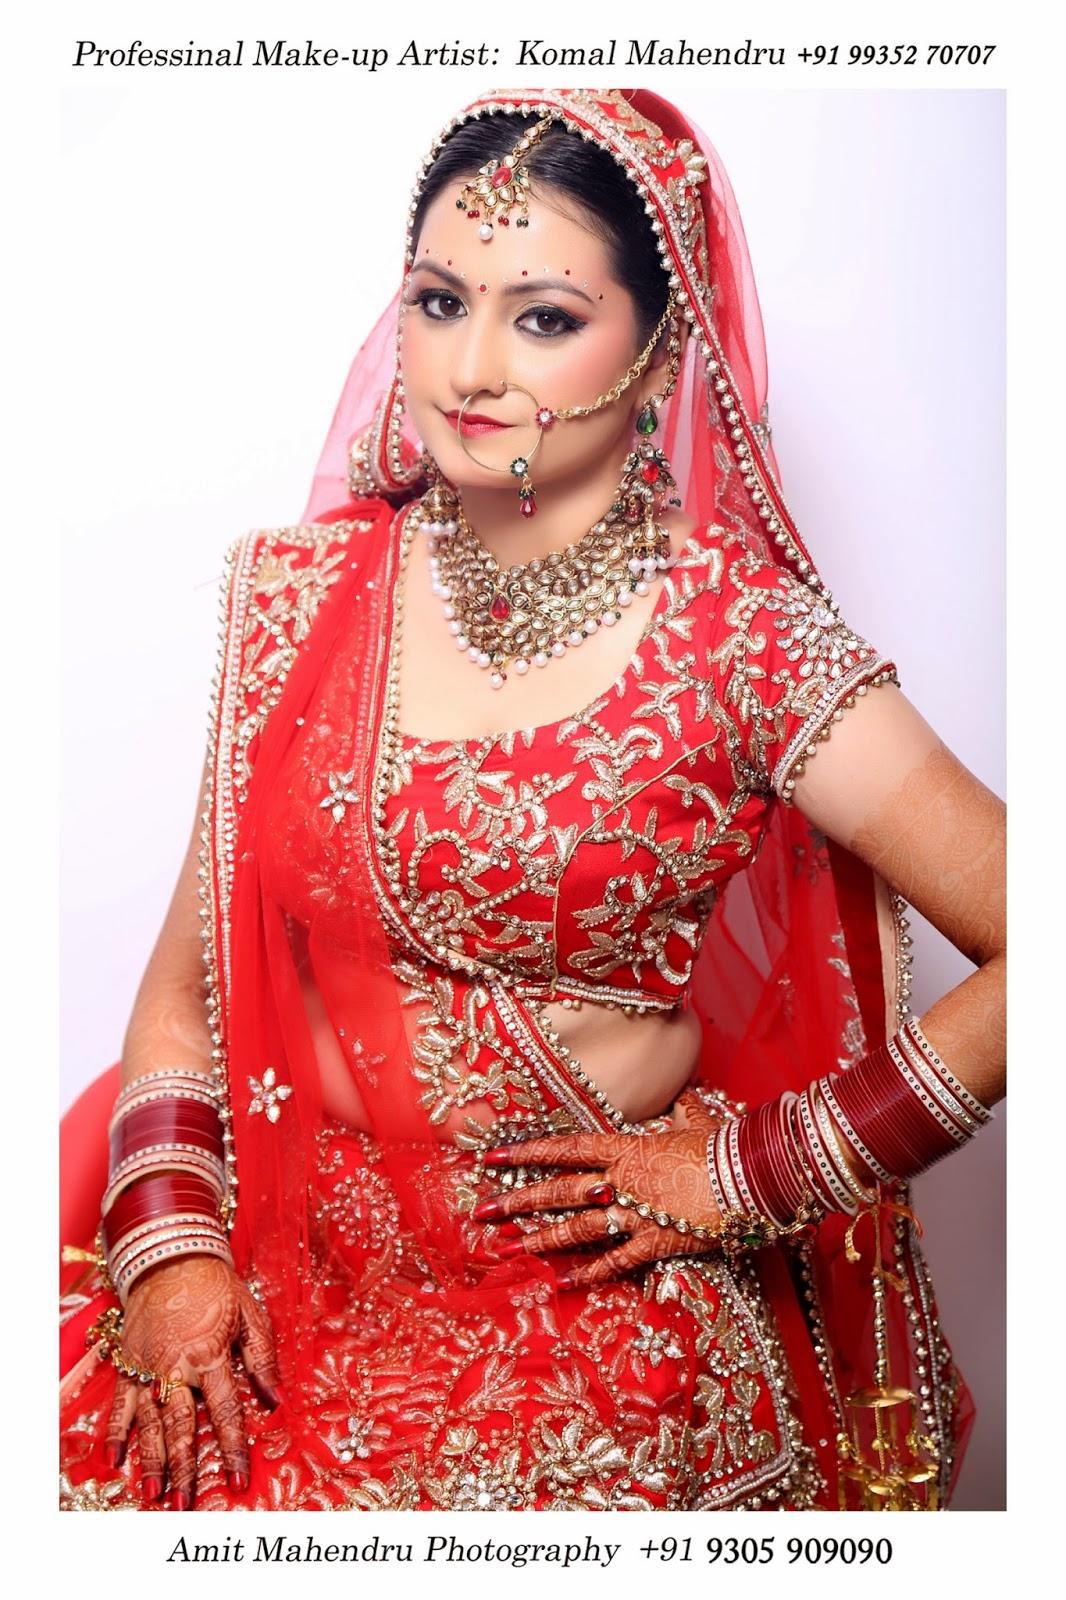 Komal Mahendru S Professional Makeup Lucknow India Beauty Salon Hair Salon Bridal Makeup Artist